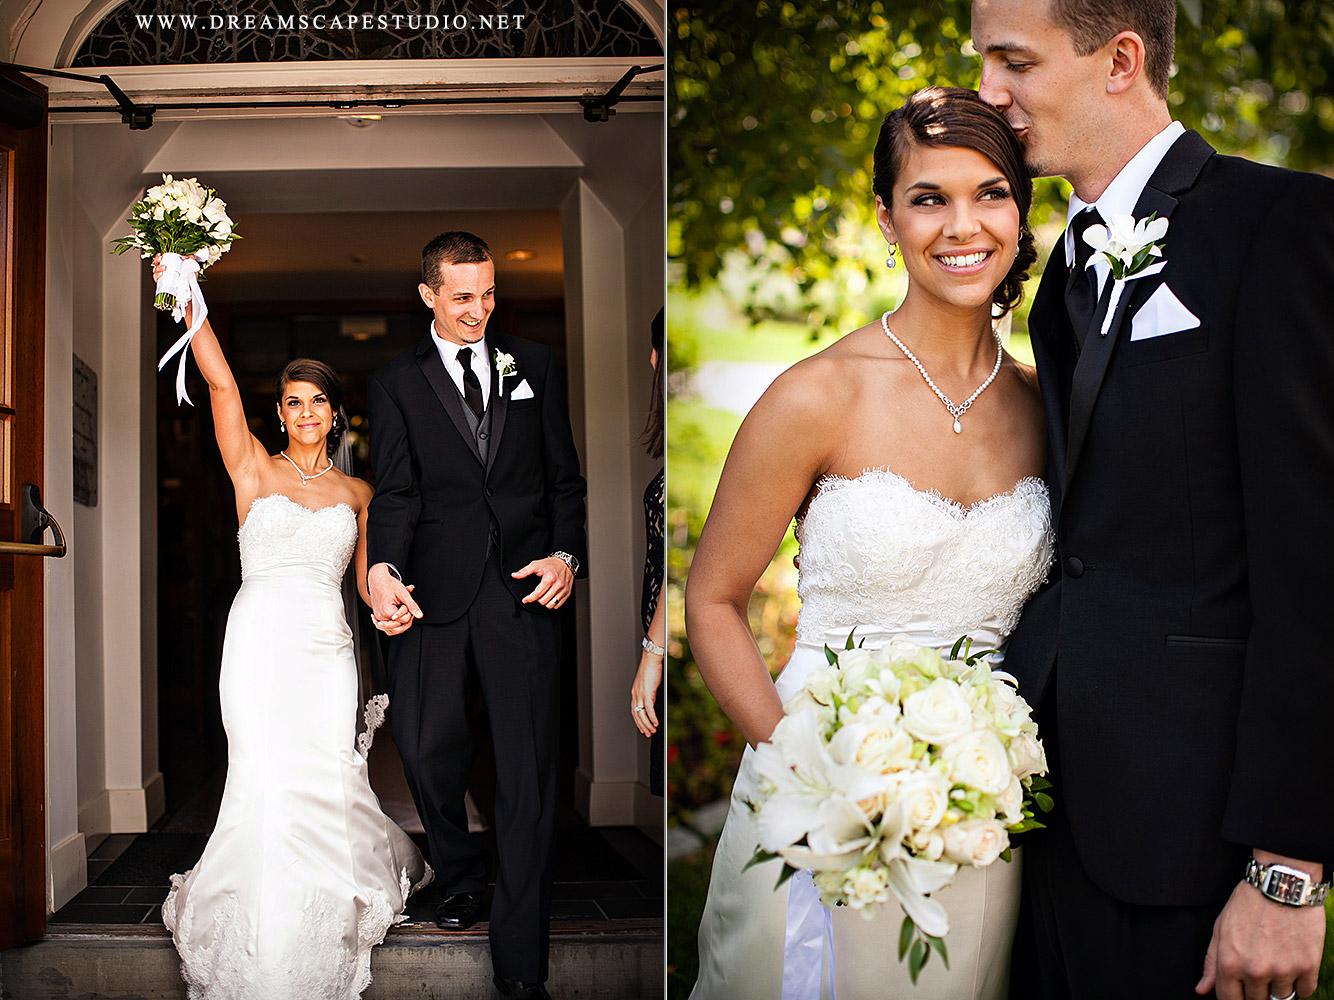 CT_Wedding_Photography_Liz_Justin_11LiJu.jpg